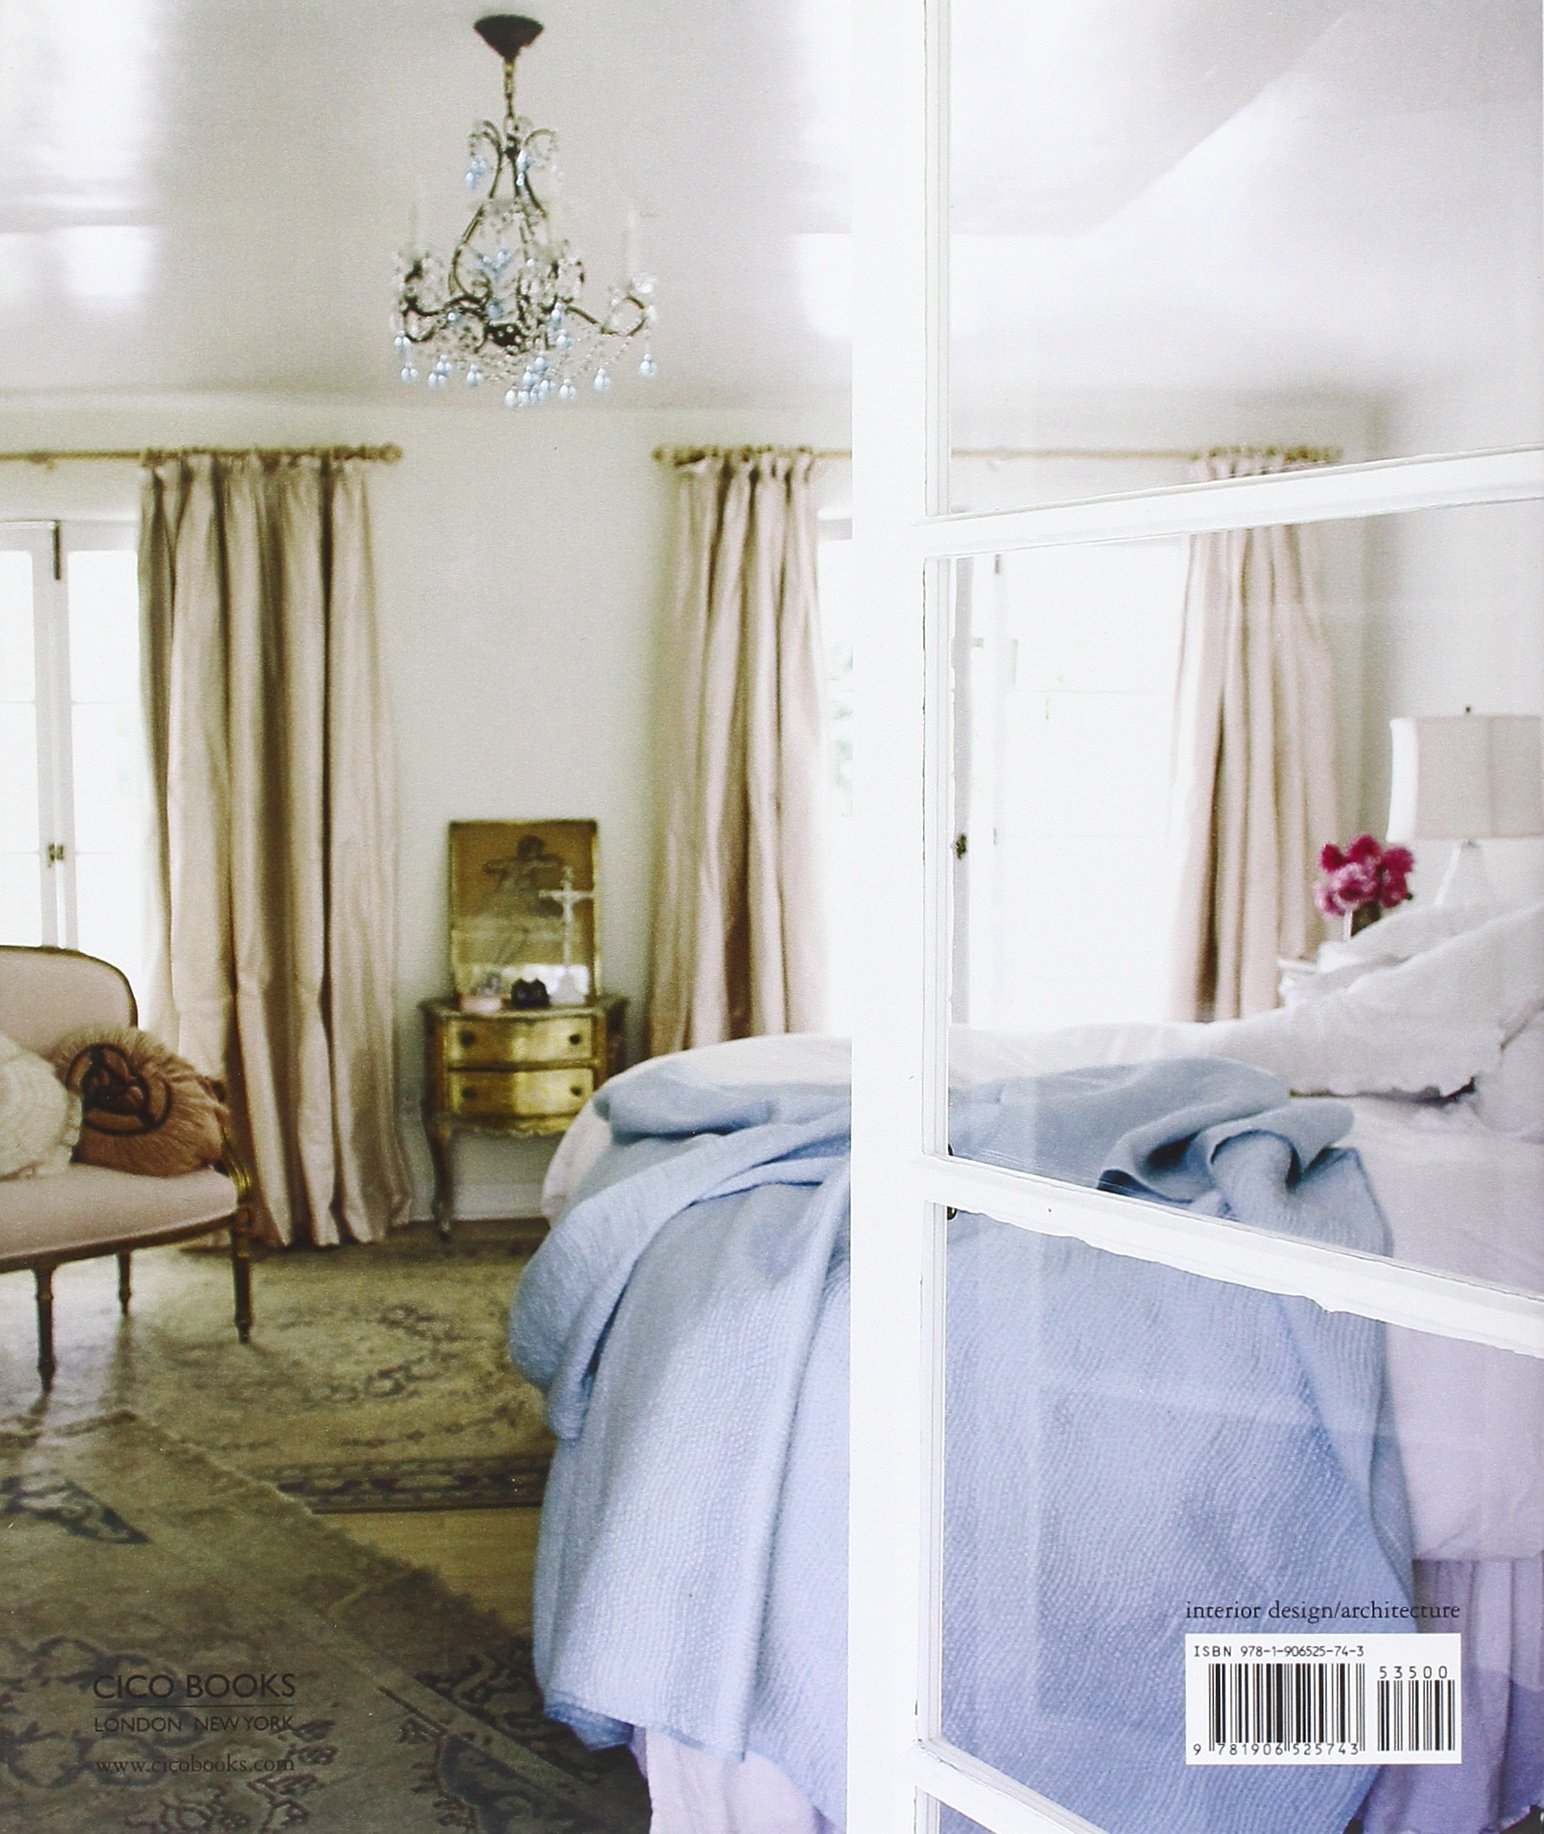 Rachel Ashwell Shabby Chic Interiors: My Rooms, Treasures and Trinkets: Amazon.es: Rachel Ashwell: Libros en idiomas extranjeros